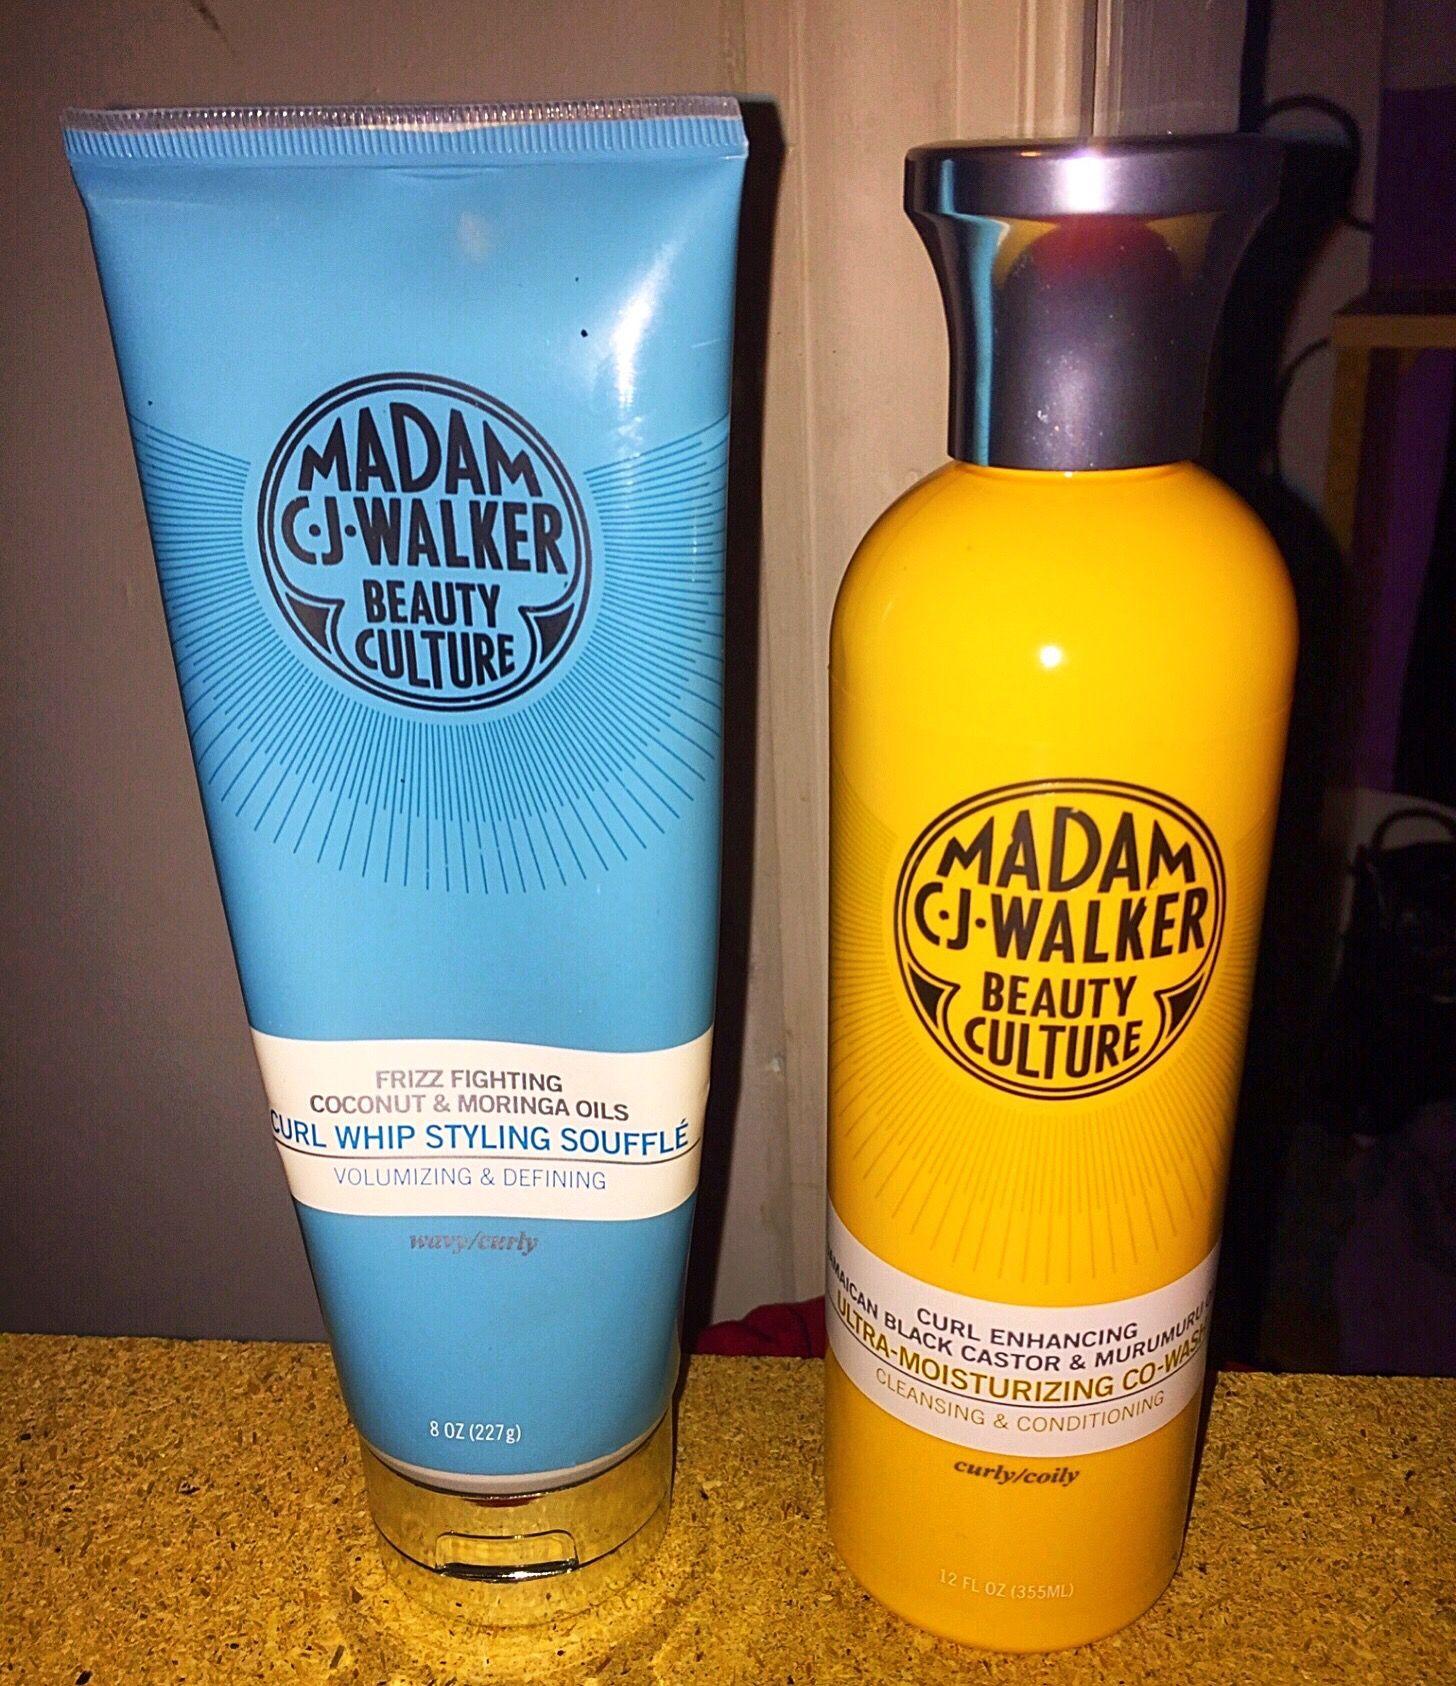 Haircare Naturalhair Madamecjwalker Sephora Jamaican Castor Oil Madam Cj Walker Natural Hair Styles